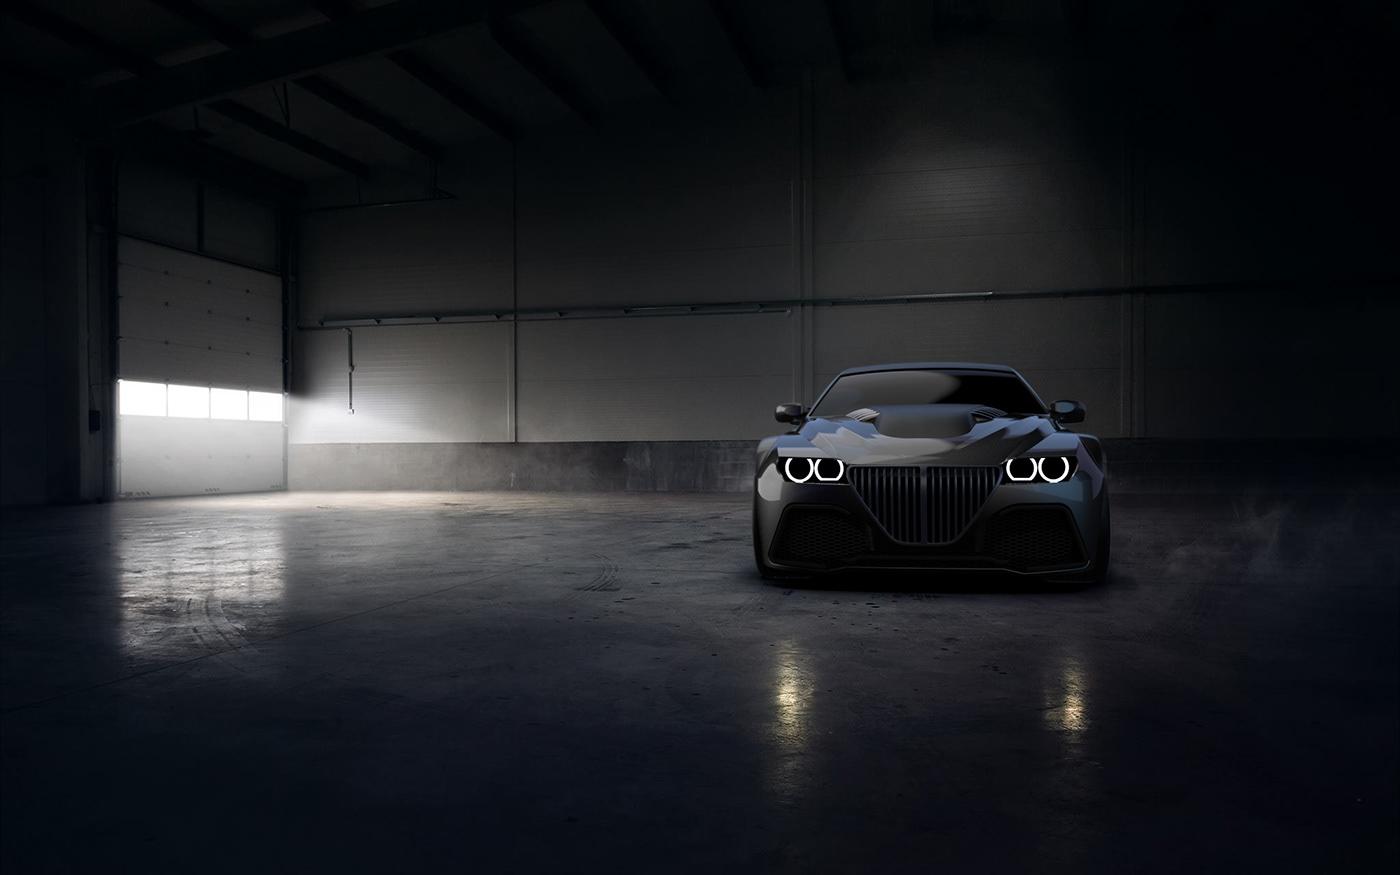 BMW brutus v12 prototype m6